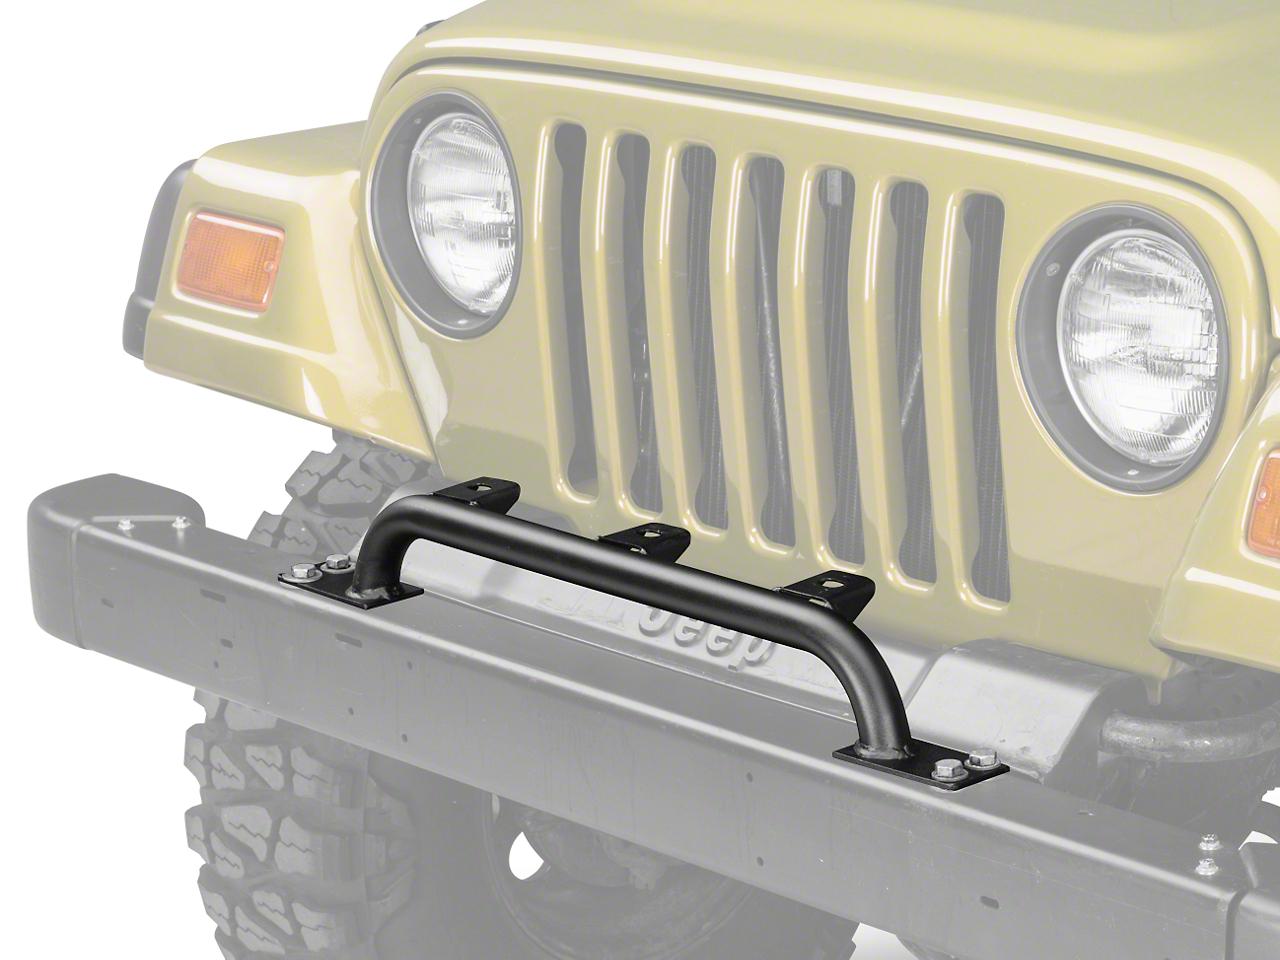 Olympic 4x4 Auxiliary Light Bar w/ 3 Light Tabs - Textured Black (87-06 Jeep Wrangler YJ & TJ)